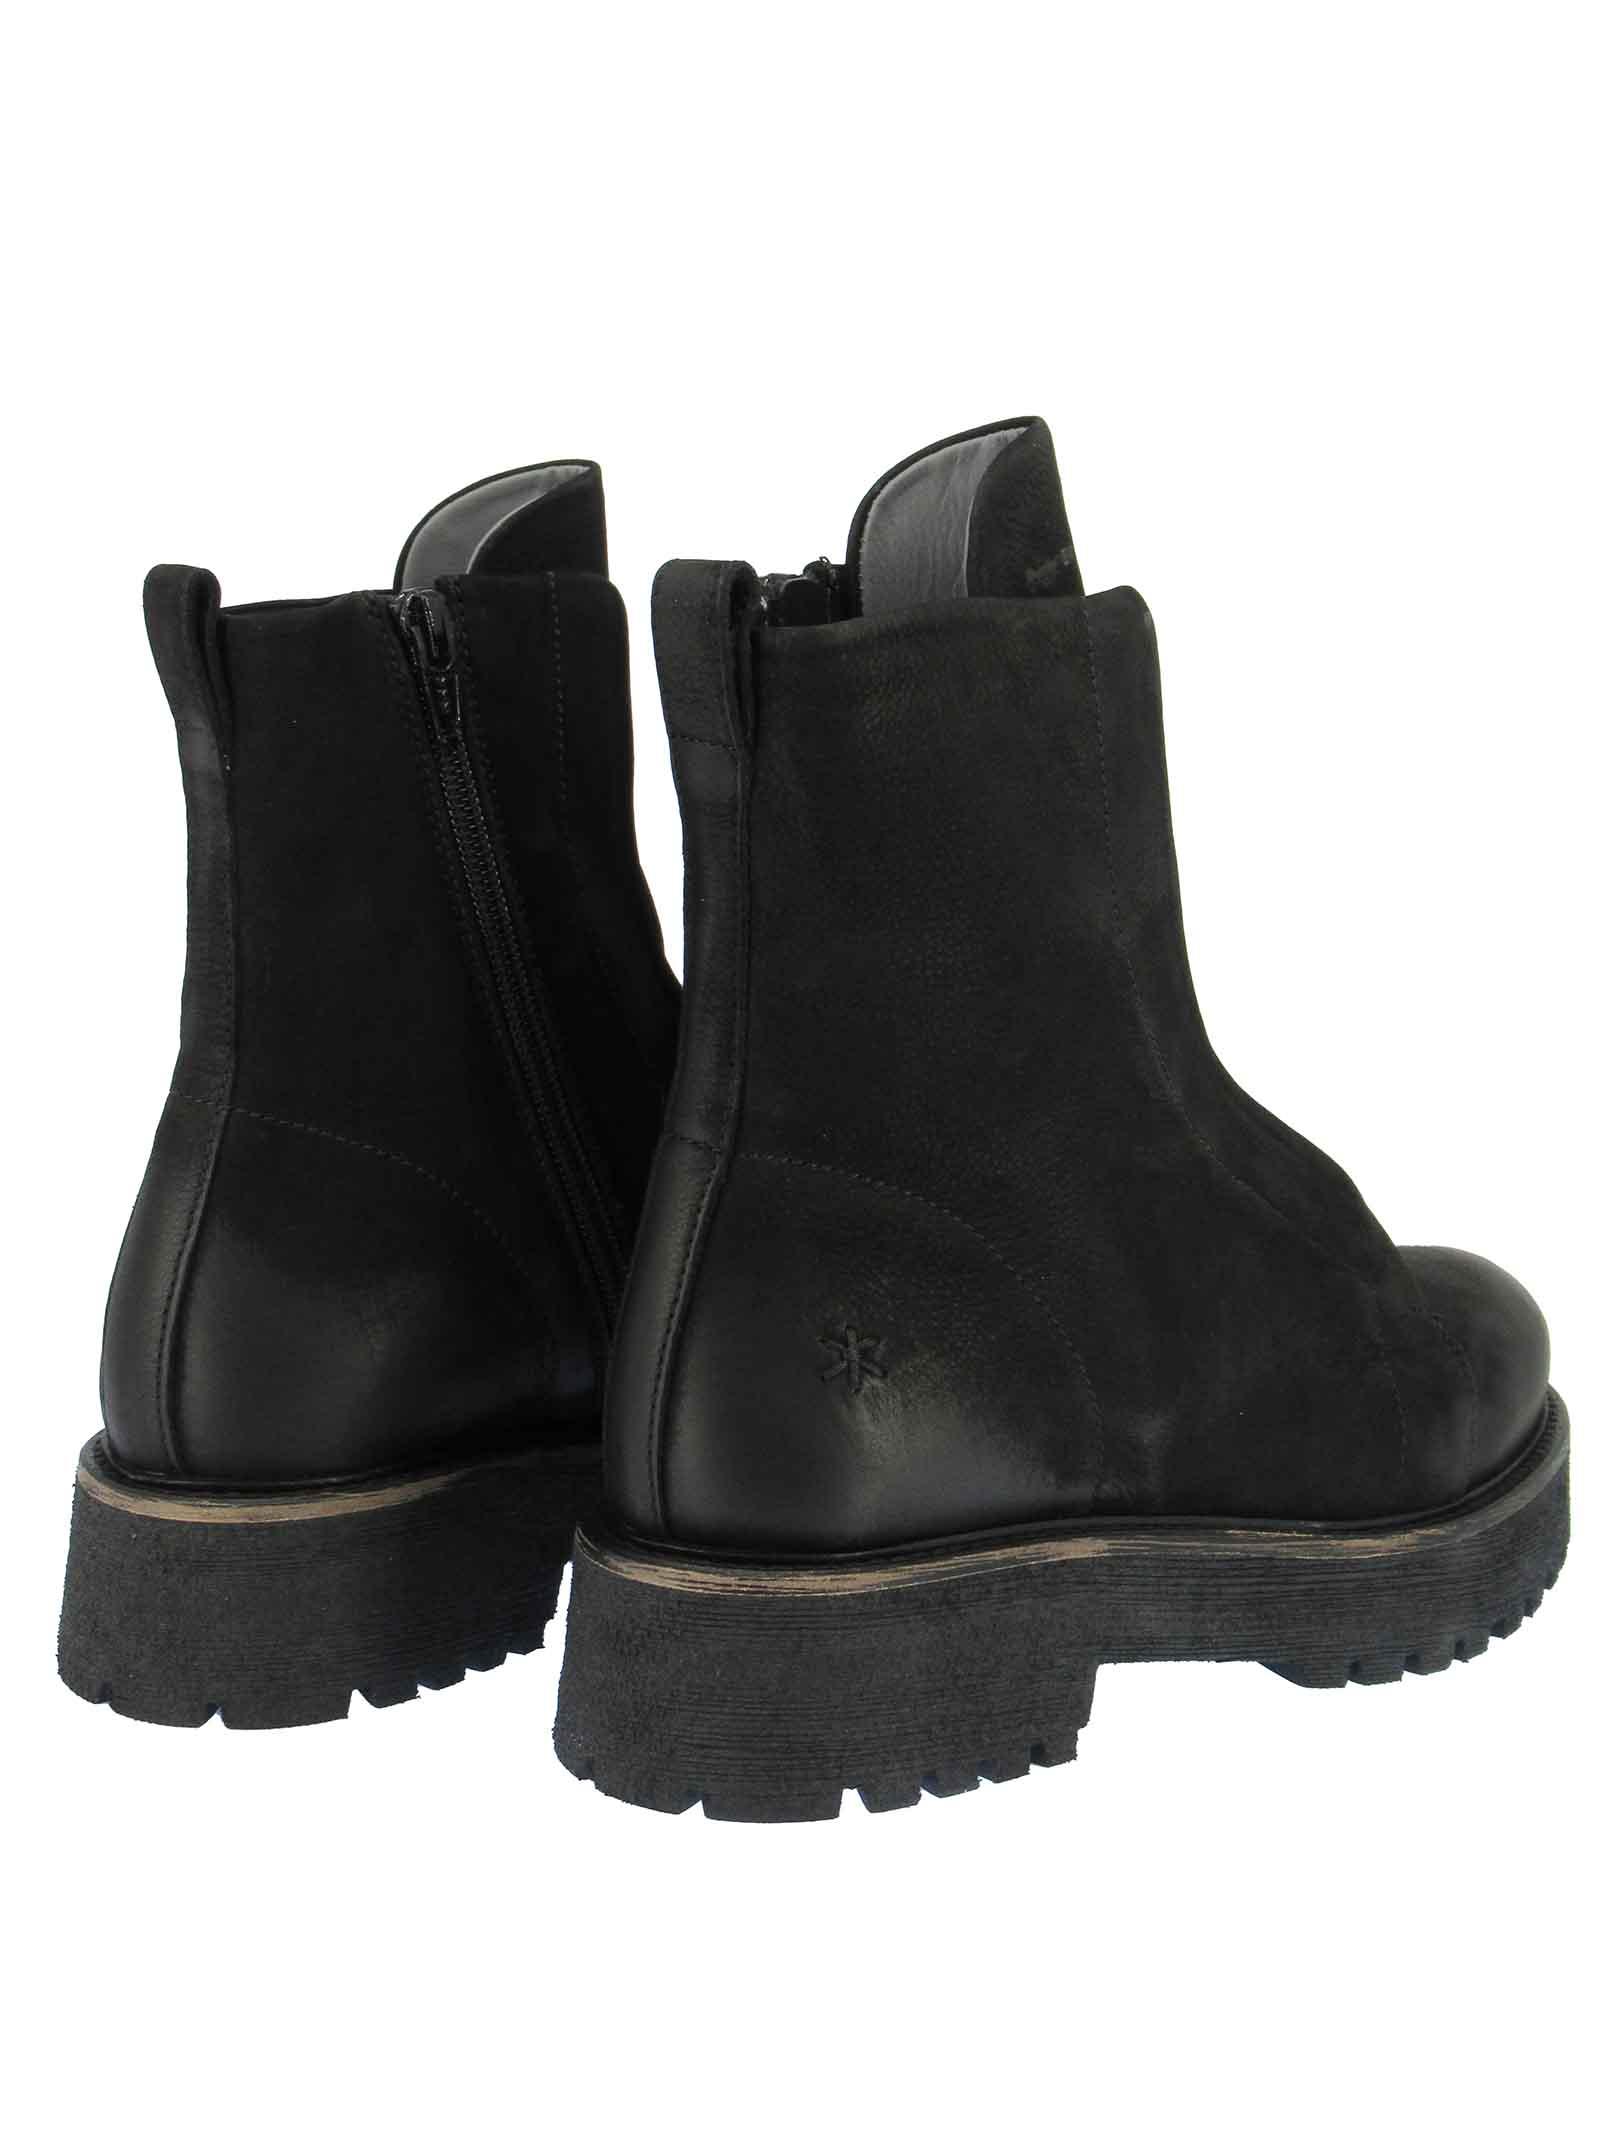 Women's Ankle Boots in Vintage Black Suede with Rubber Sole Tank Patrizia Bonfanti | Ankle Boots | KUNI001